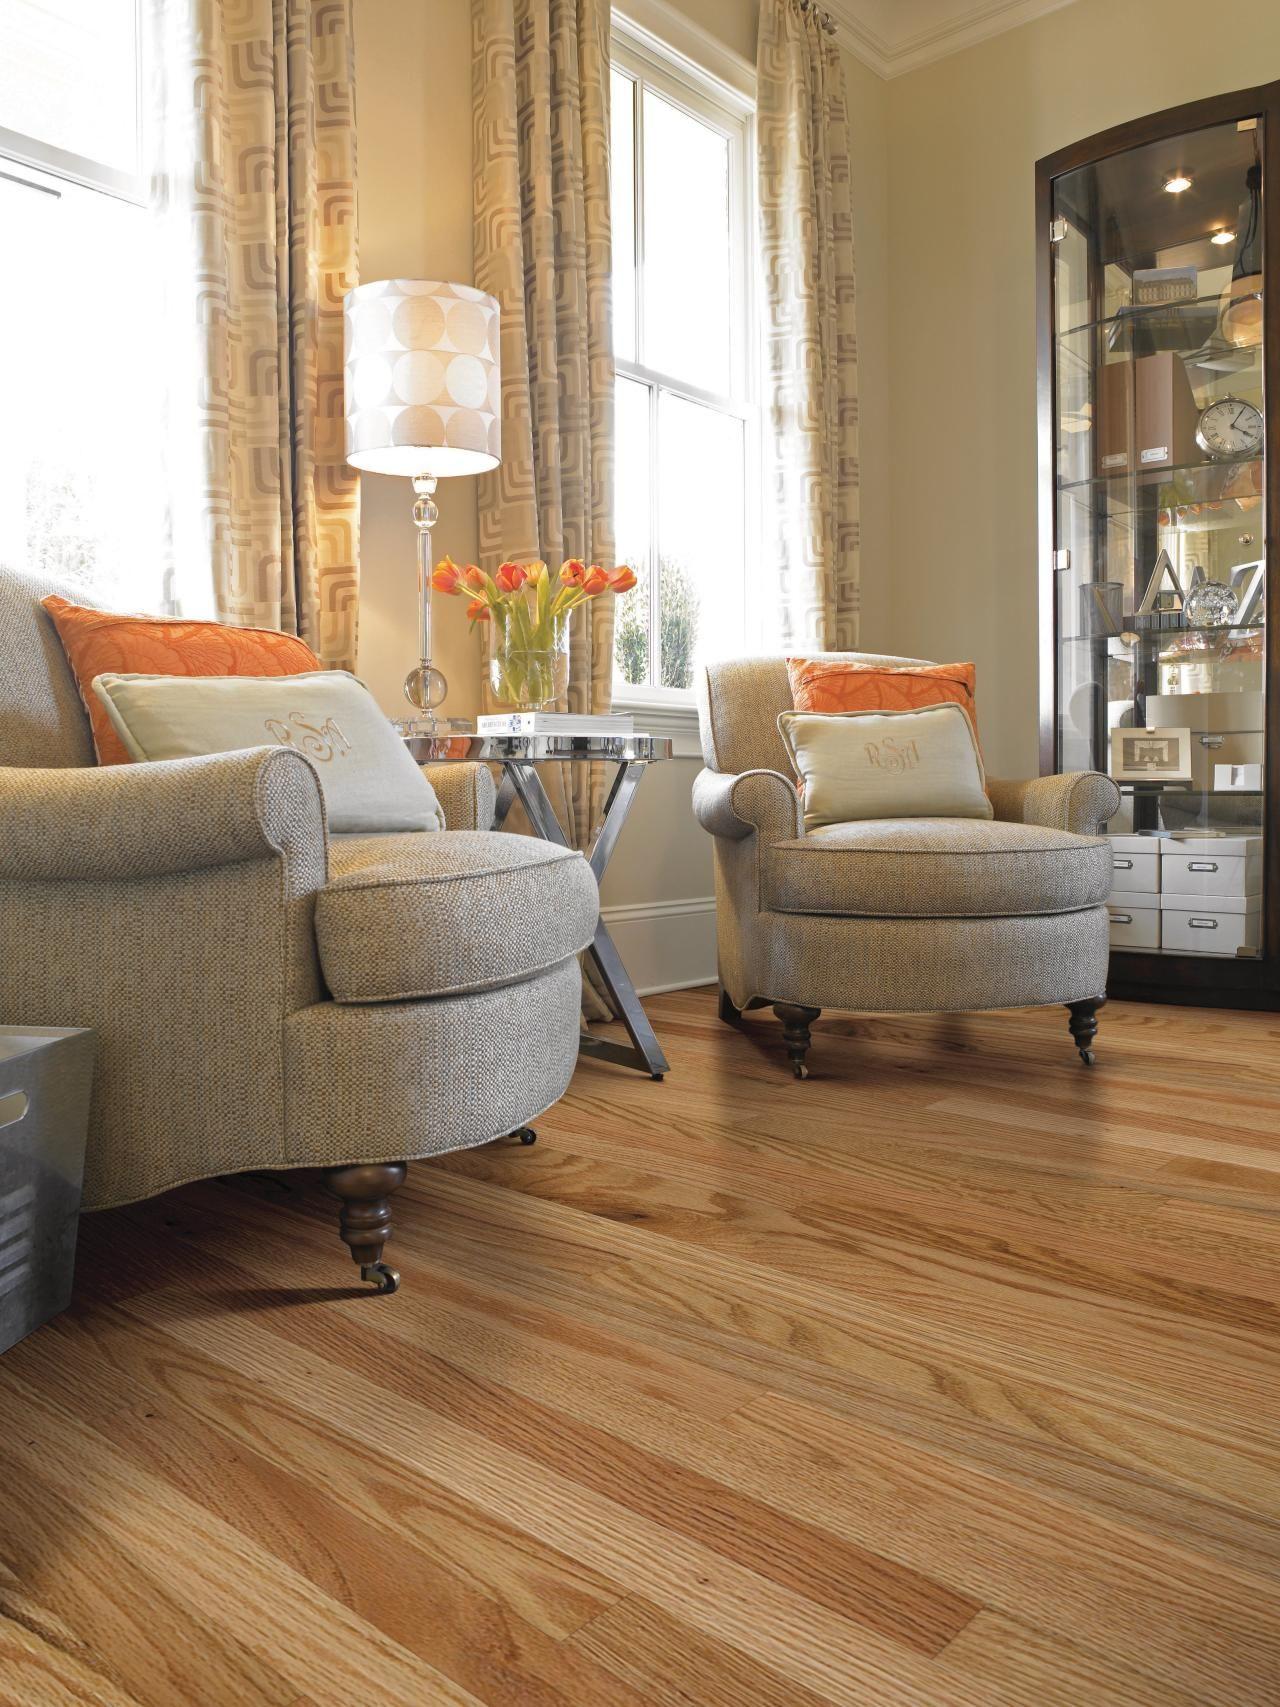 10 stunning hardwood flooring options interior design - 10 Stunning Hardwood Flooring Options